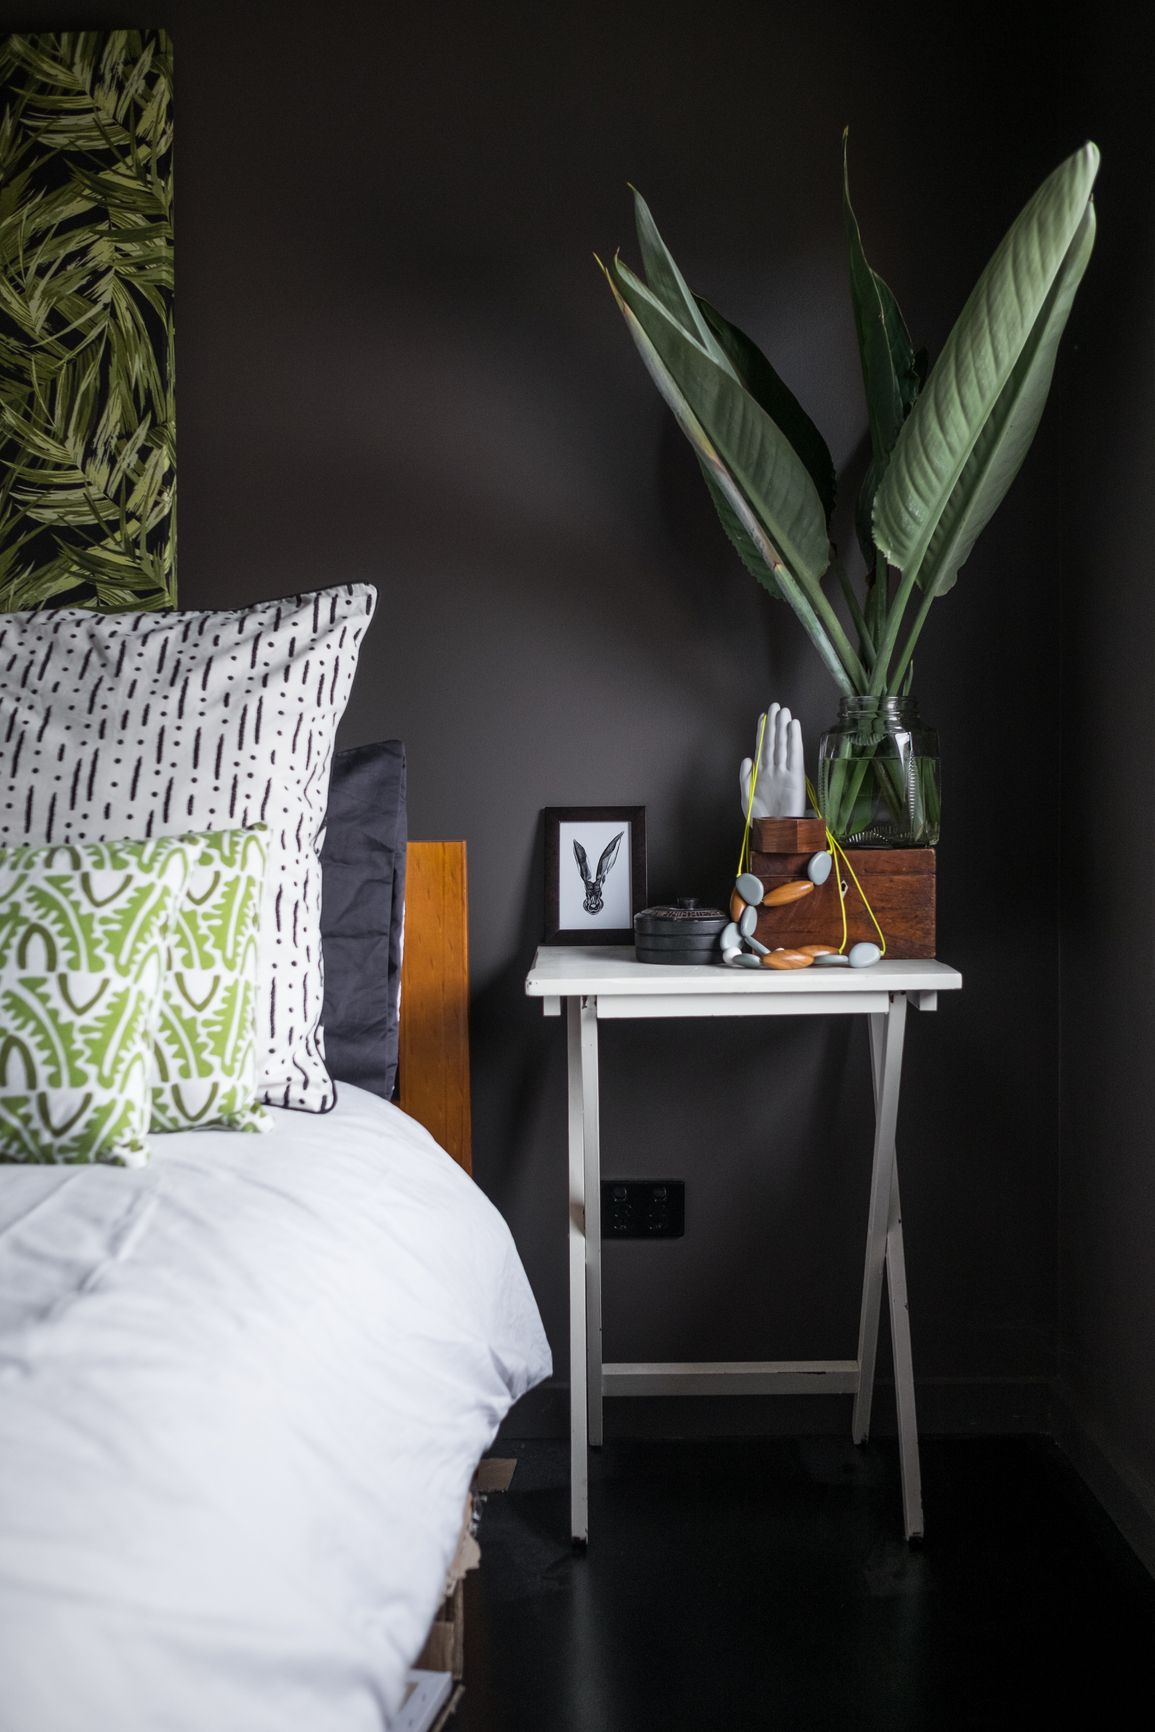 Styled bedroom interior